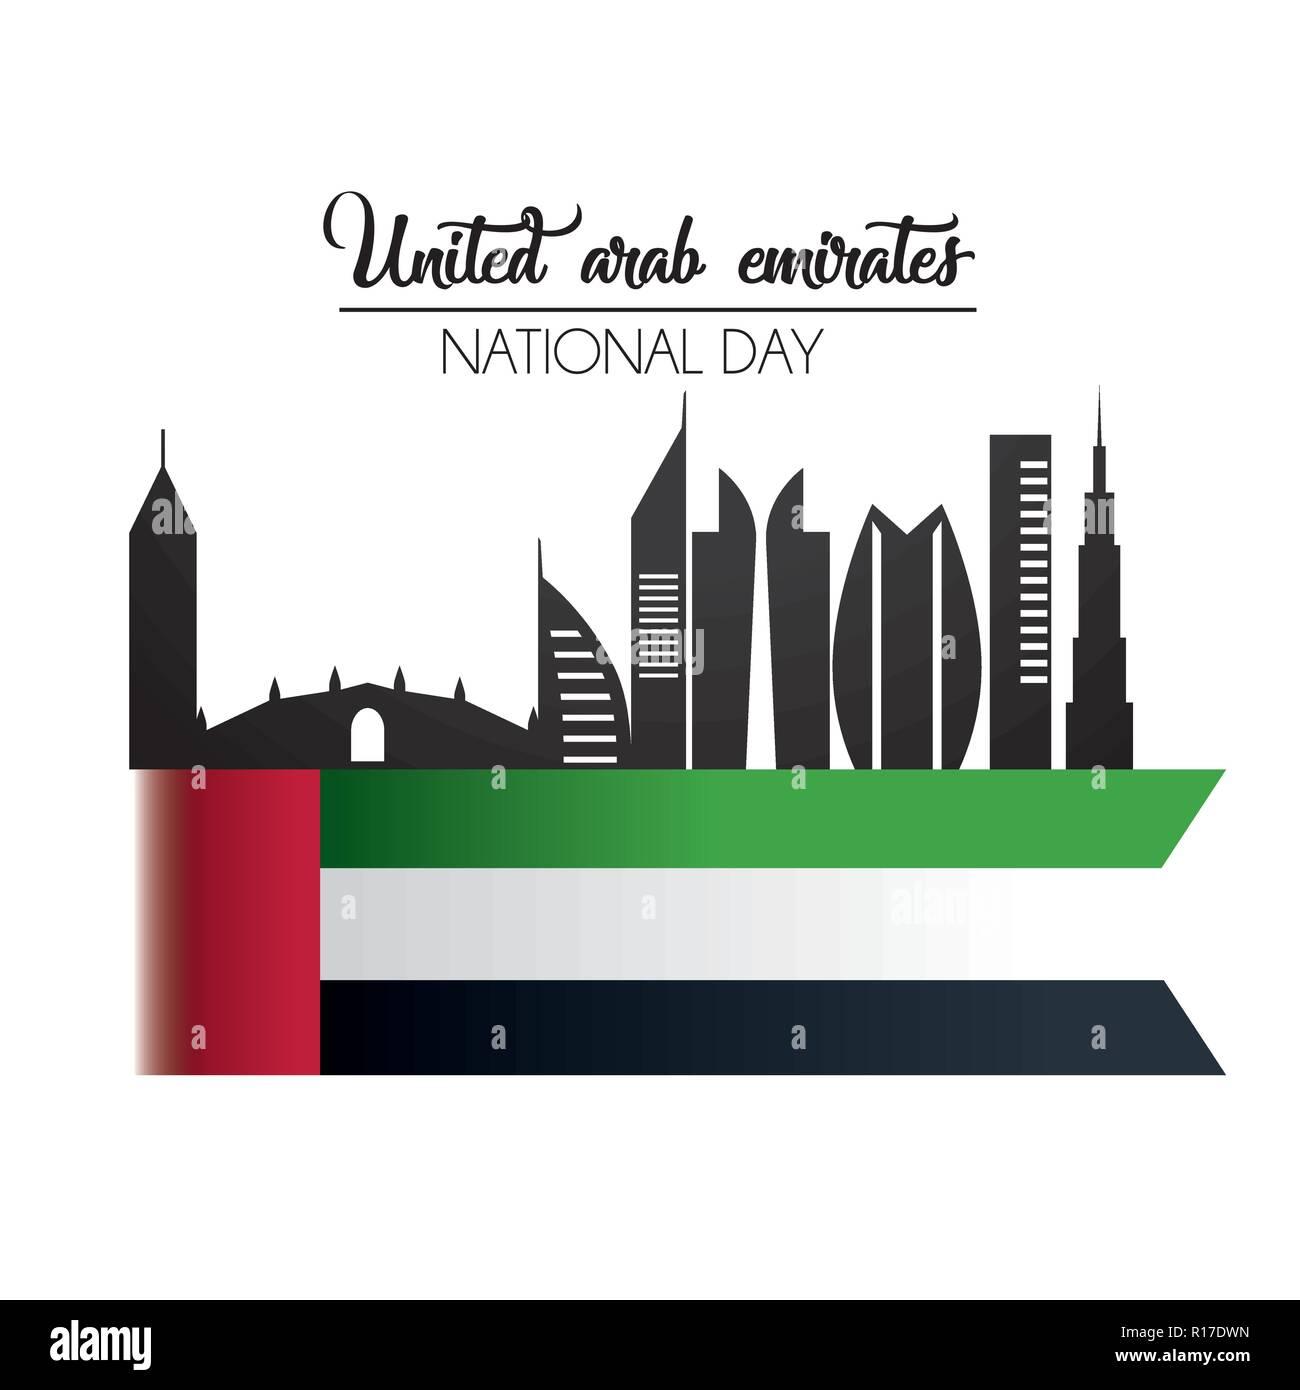 uae flag with building to national day celebration - Stock Image